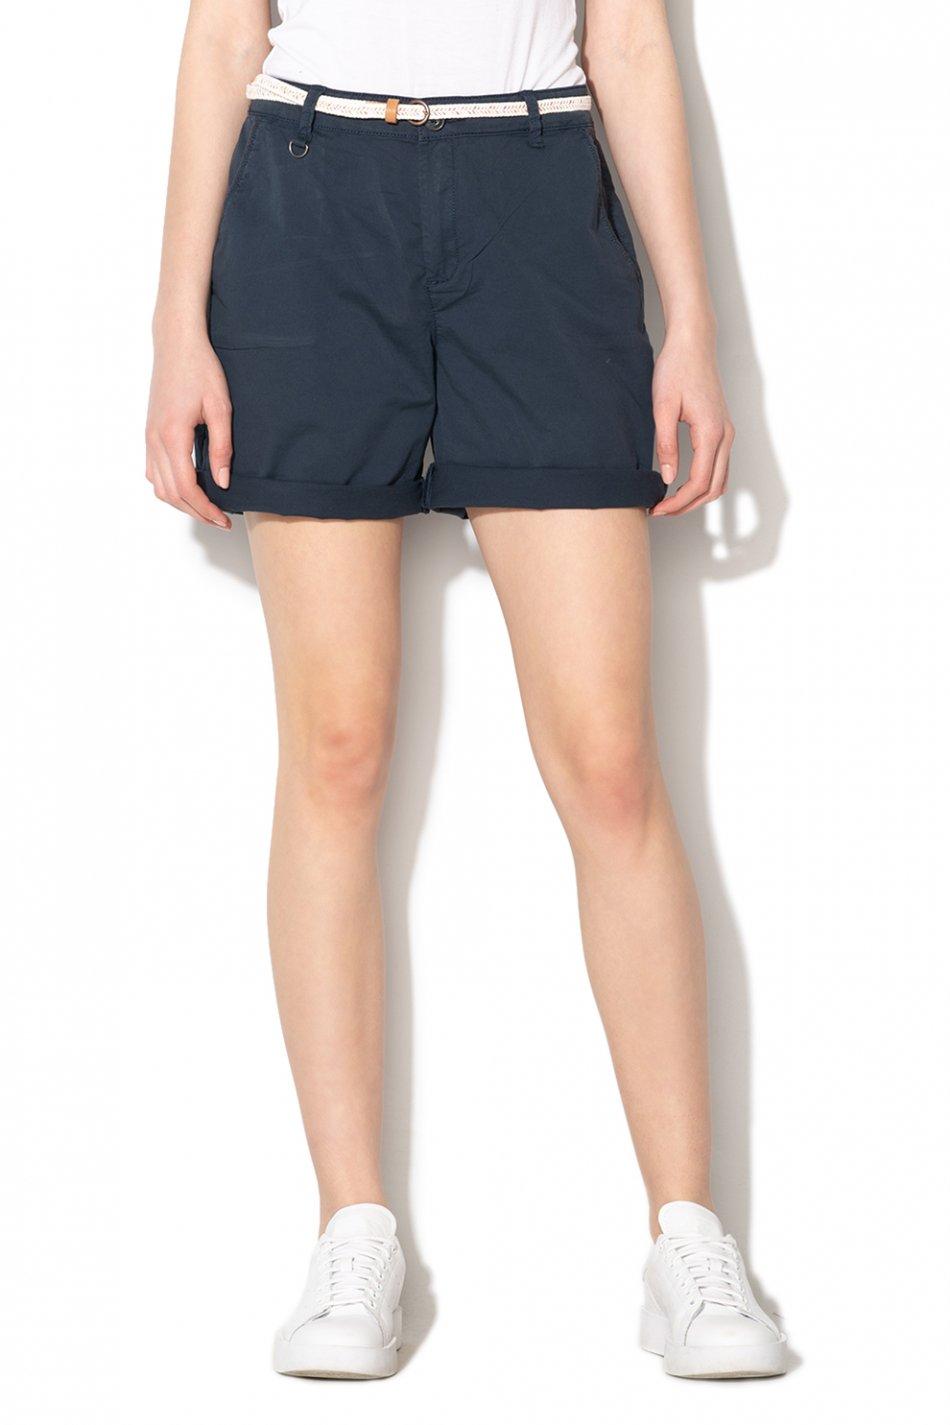 Esprit, Pantaloni scurti chino cu o curea cu aspect tesut, Bleumarin, 40